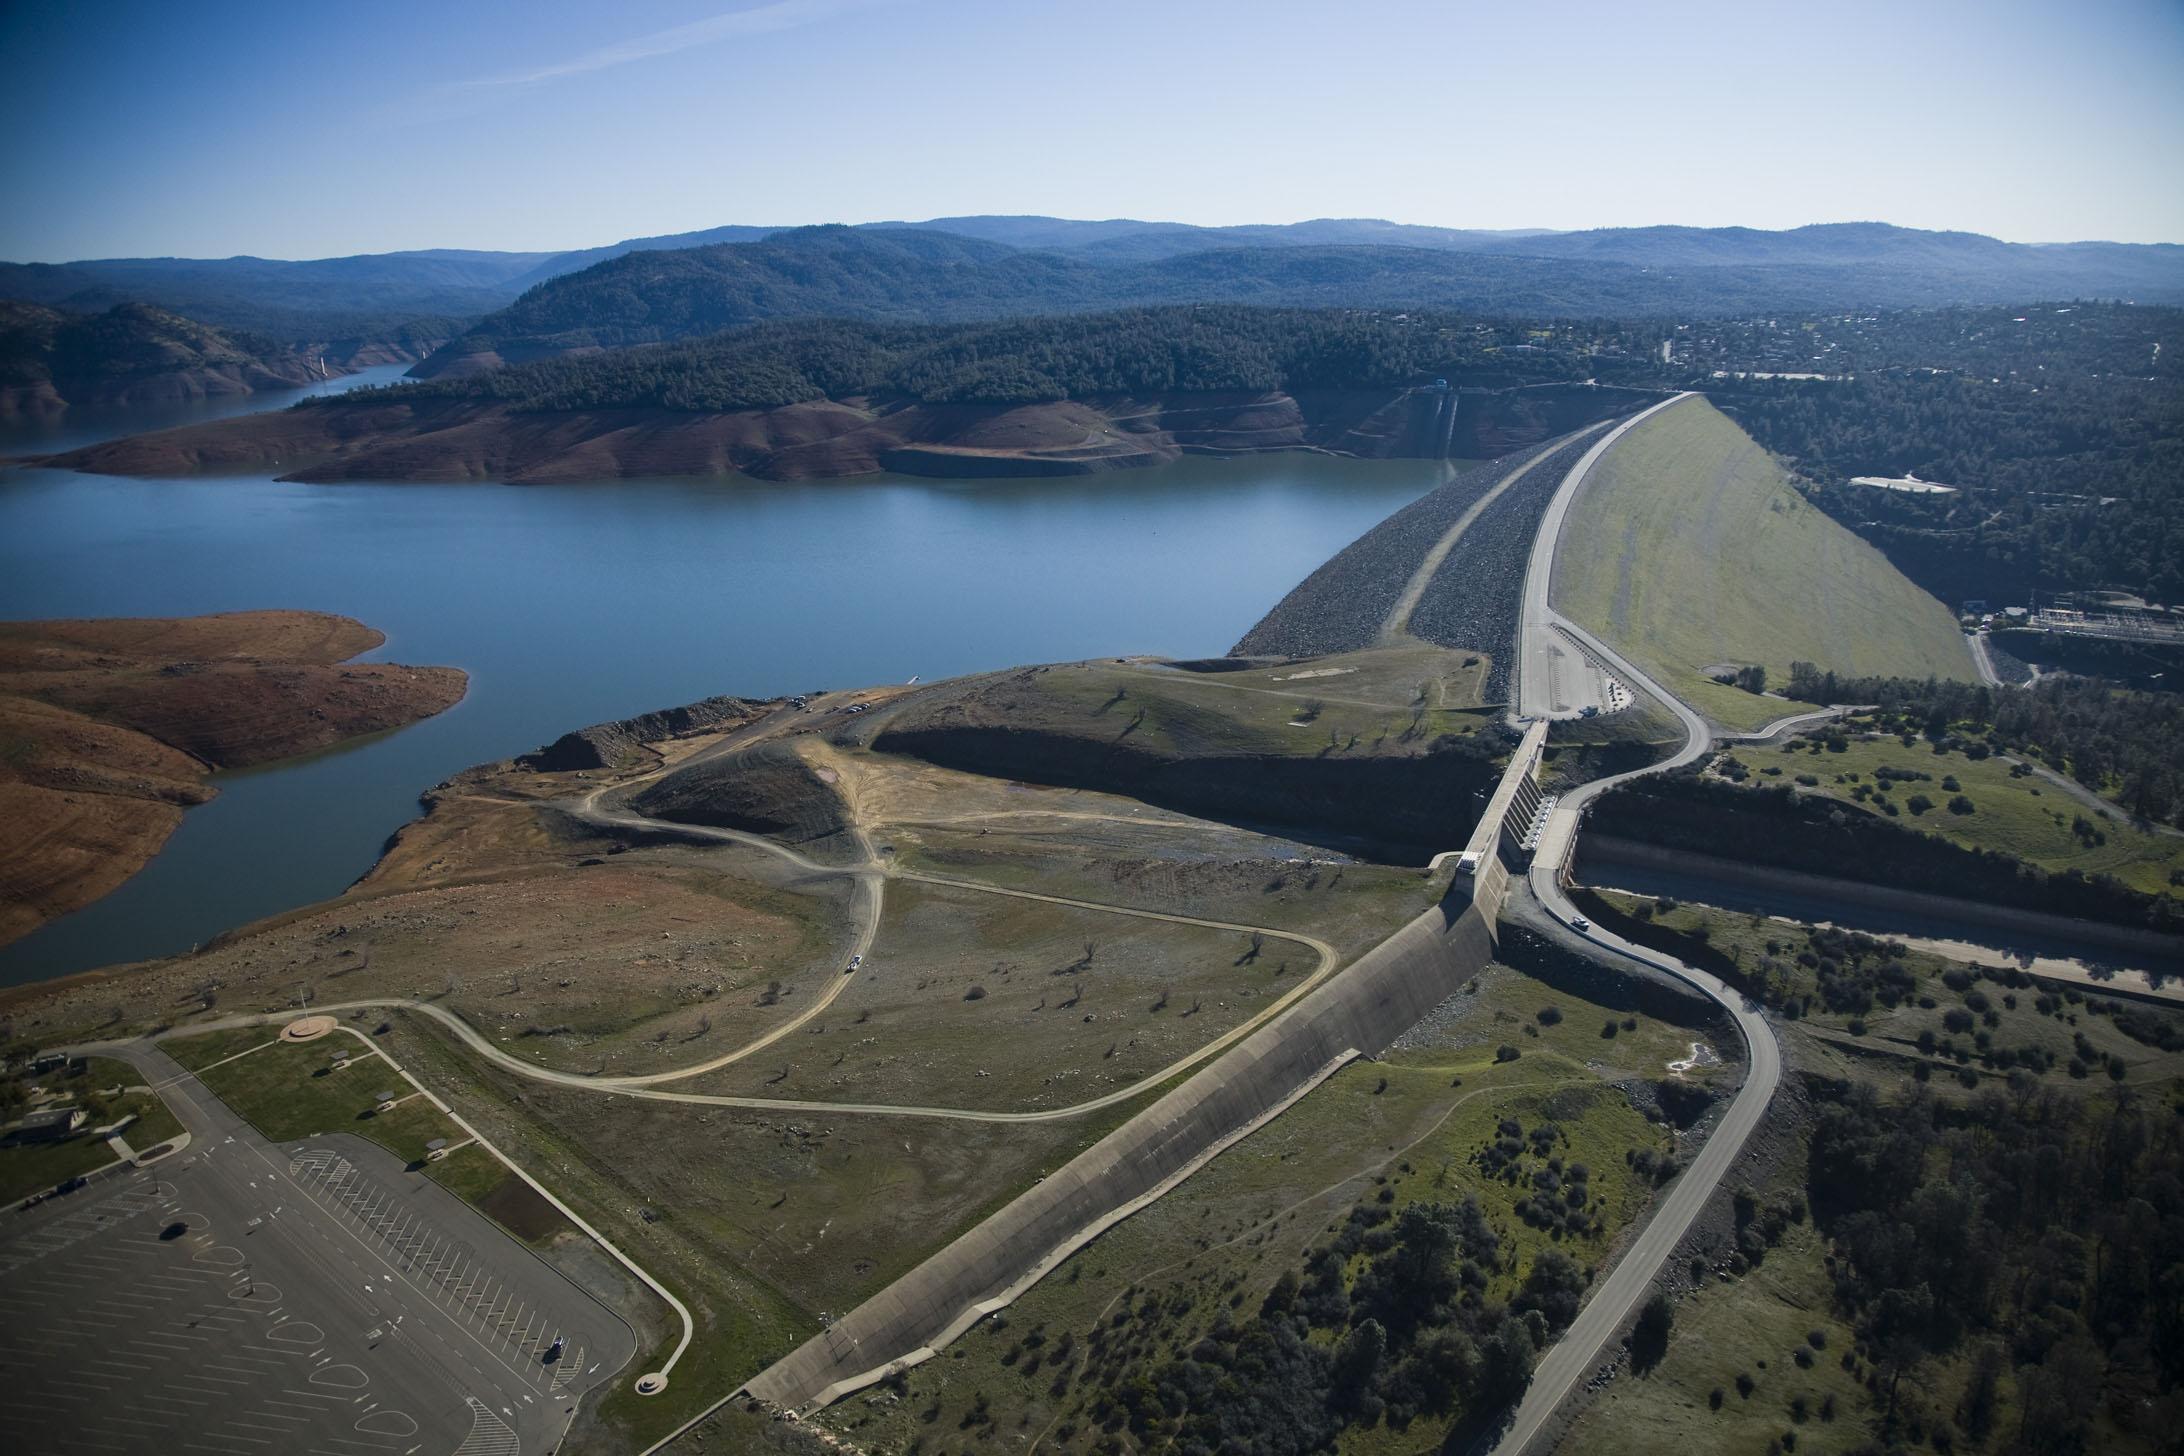 Oroville Lake and Dam circa 2014